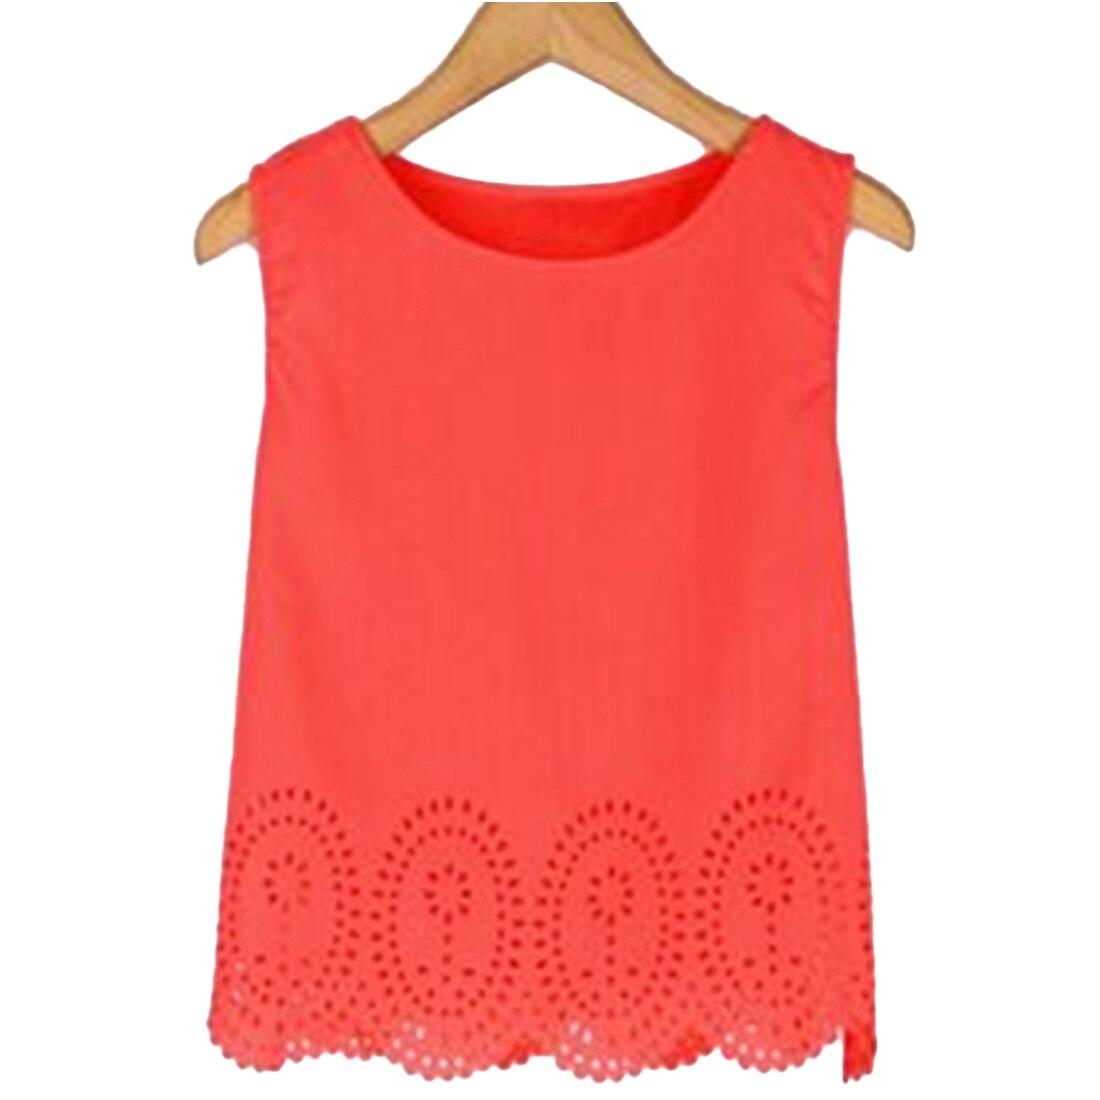 Dames Sweet Casual Korte blouse Mouwloos O Hals Topkwaliteit Zomer - Dameskleding